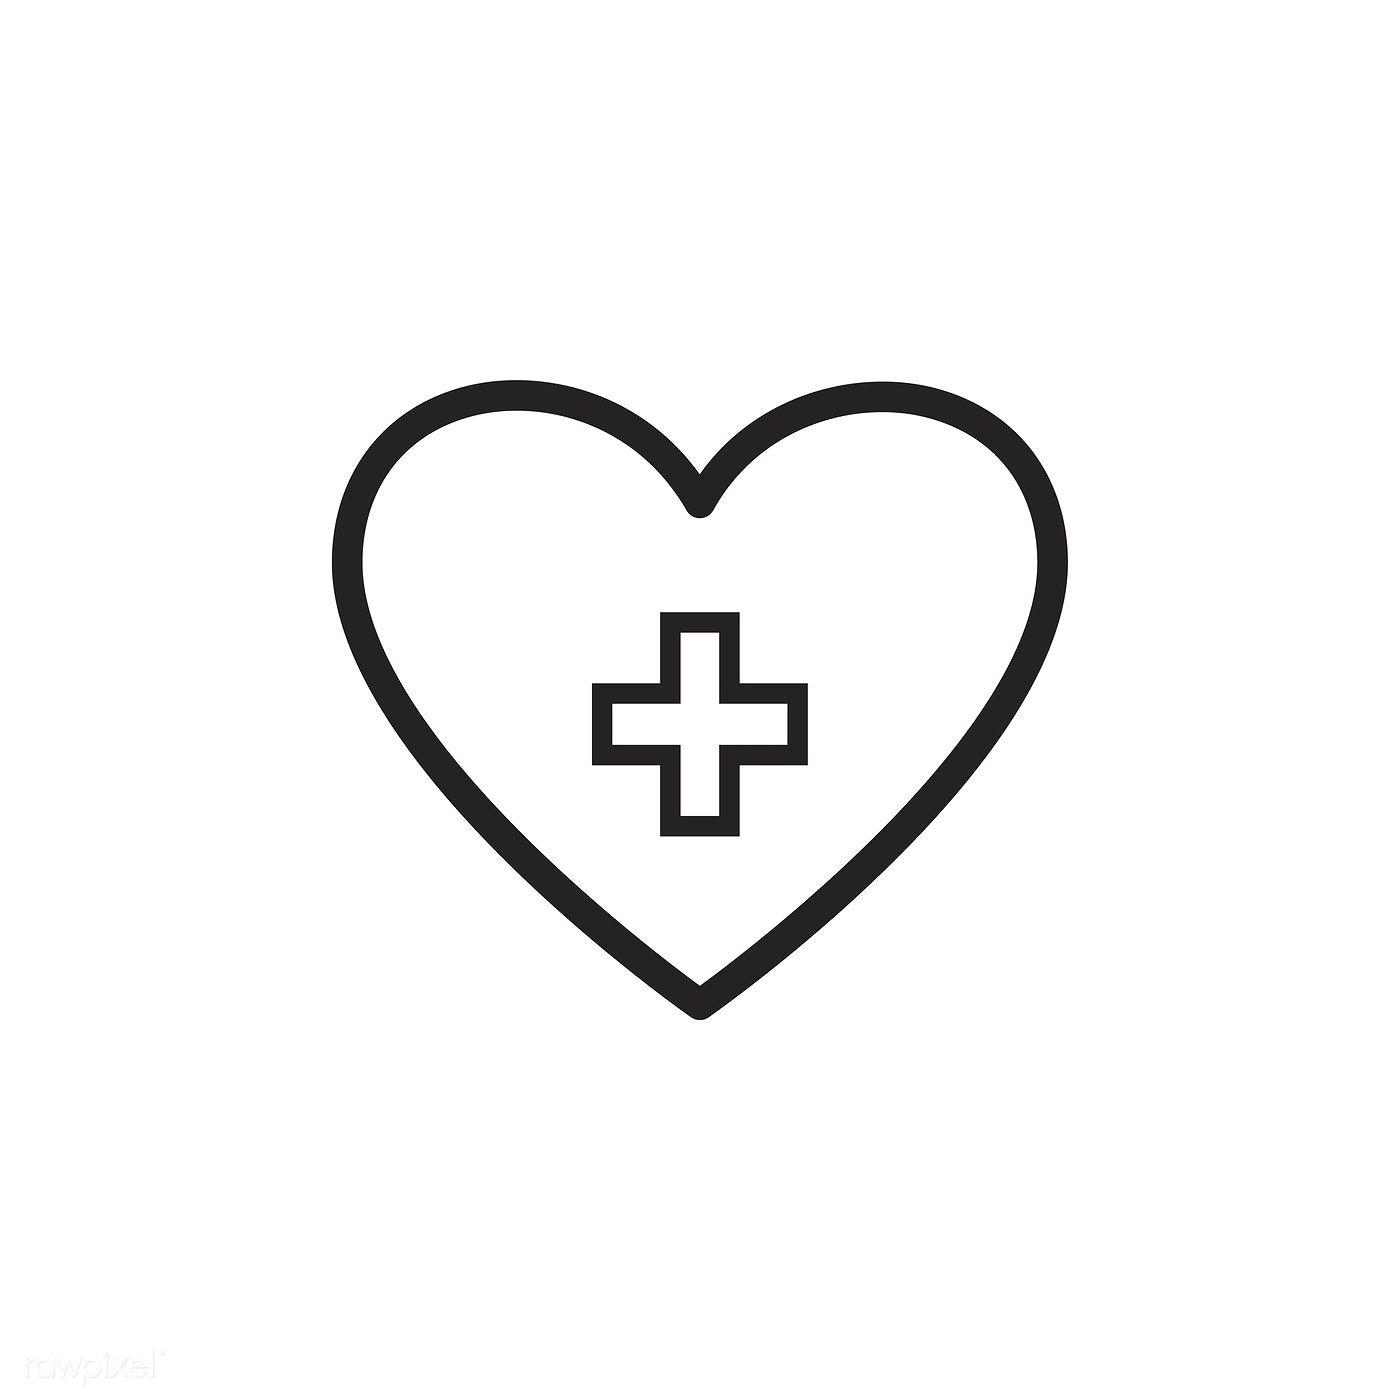 Download Premium Vector Of Healthy Heart Icon Vector 533358 Heart Icons Heart App Human Heart Outline